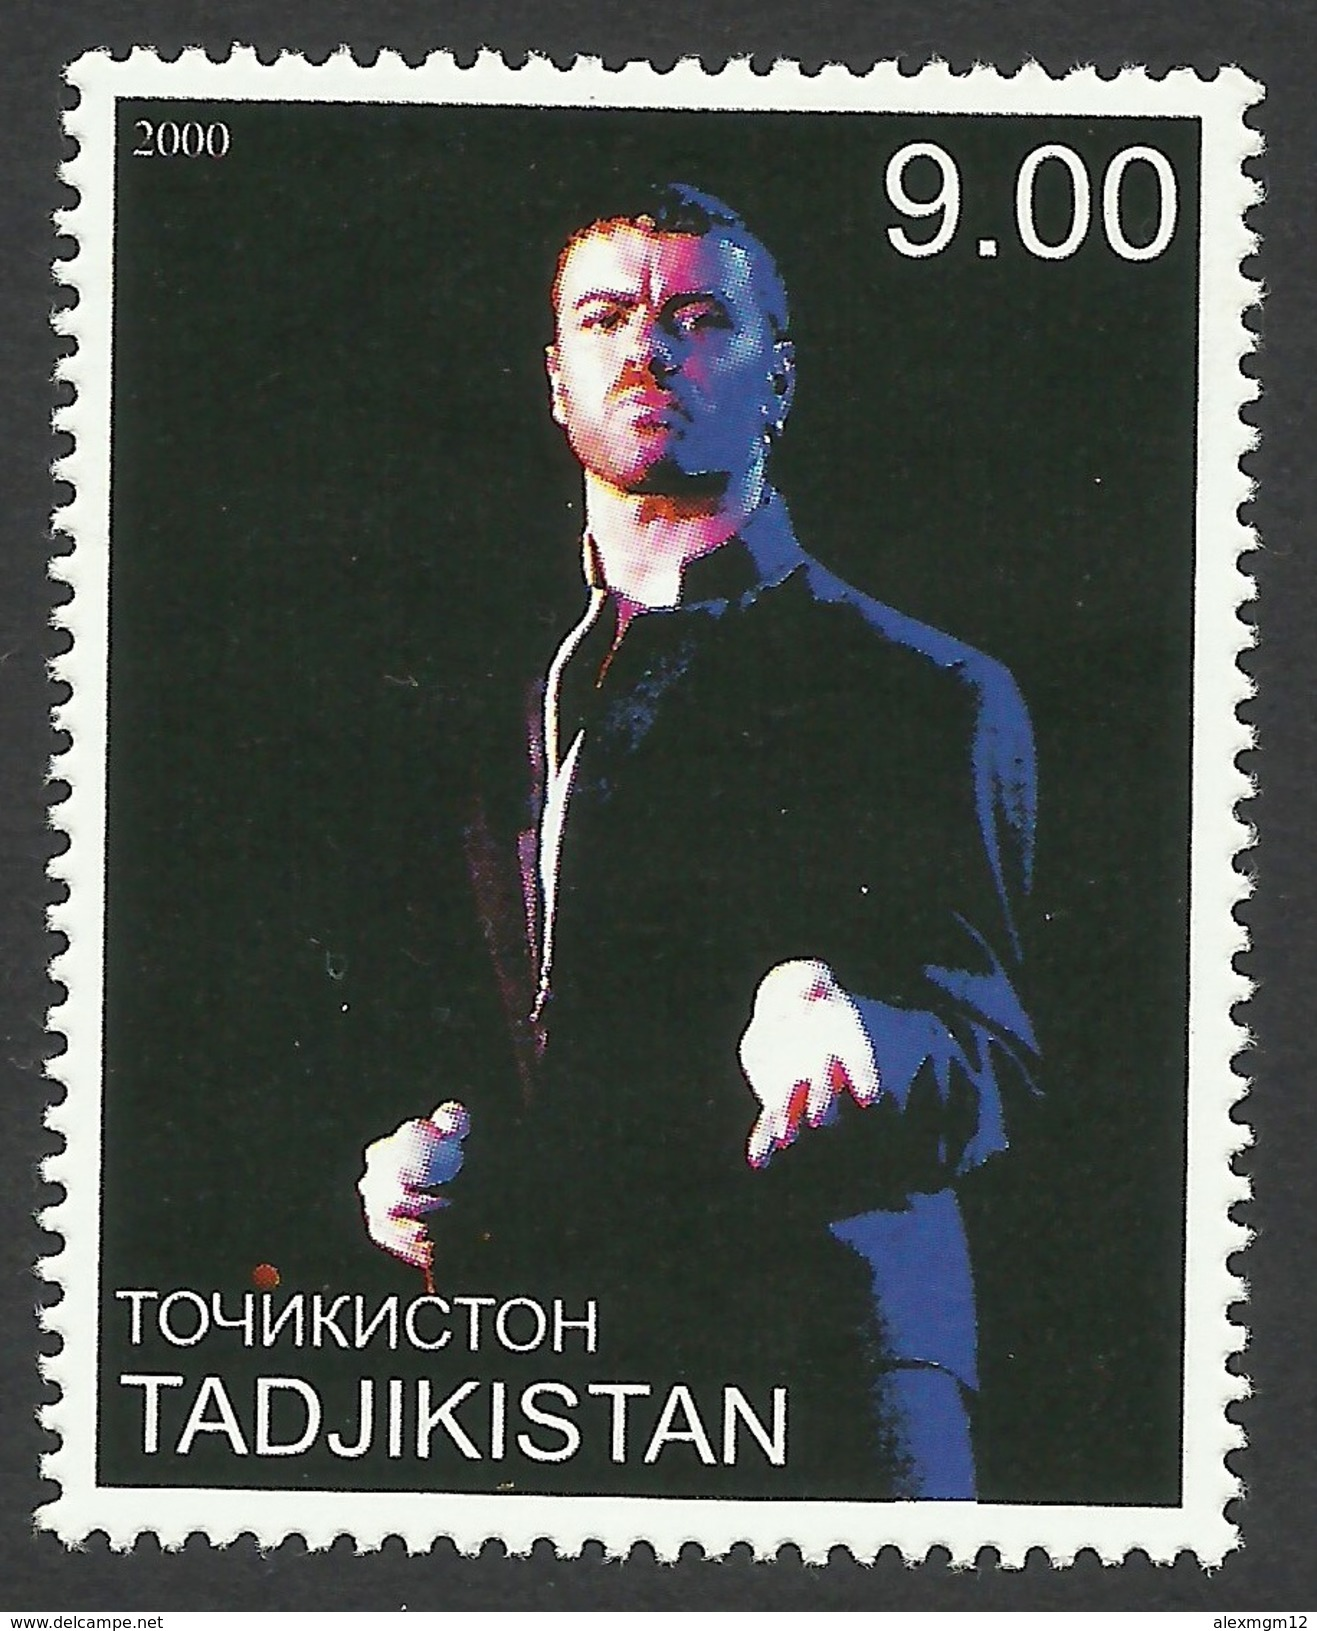 Tajikistan, 9 S. 2000, George Michael, MNH - Tajikistan